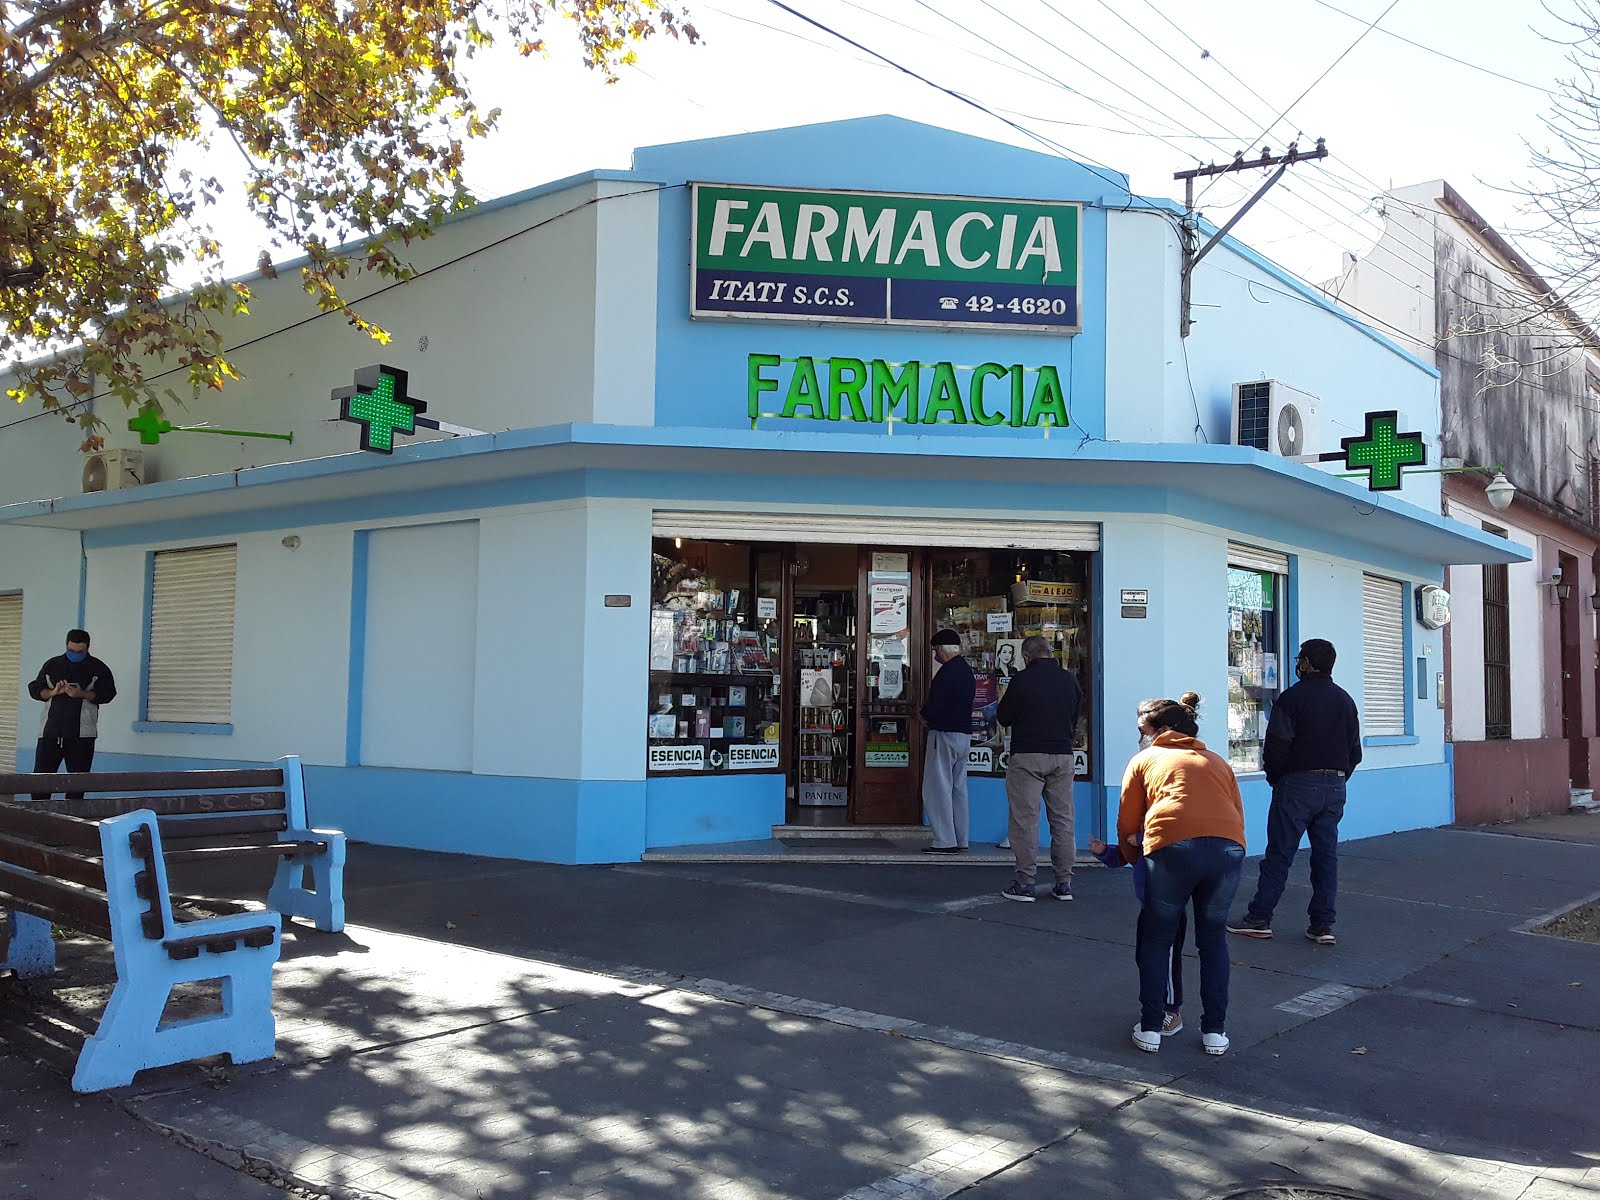 FARMACIA ITATI